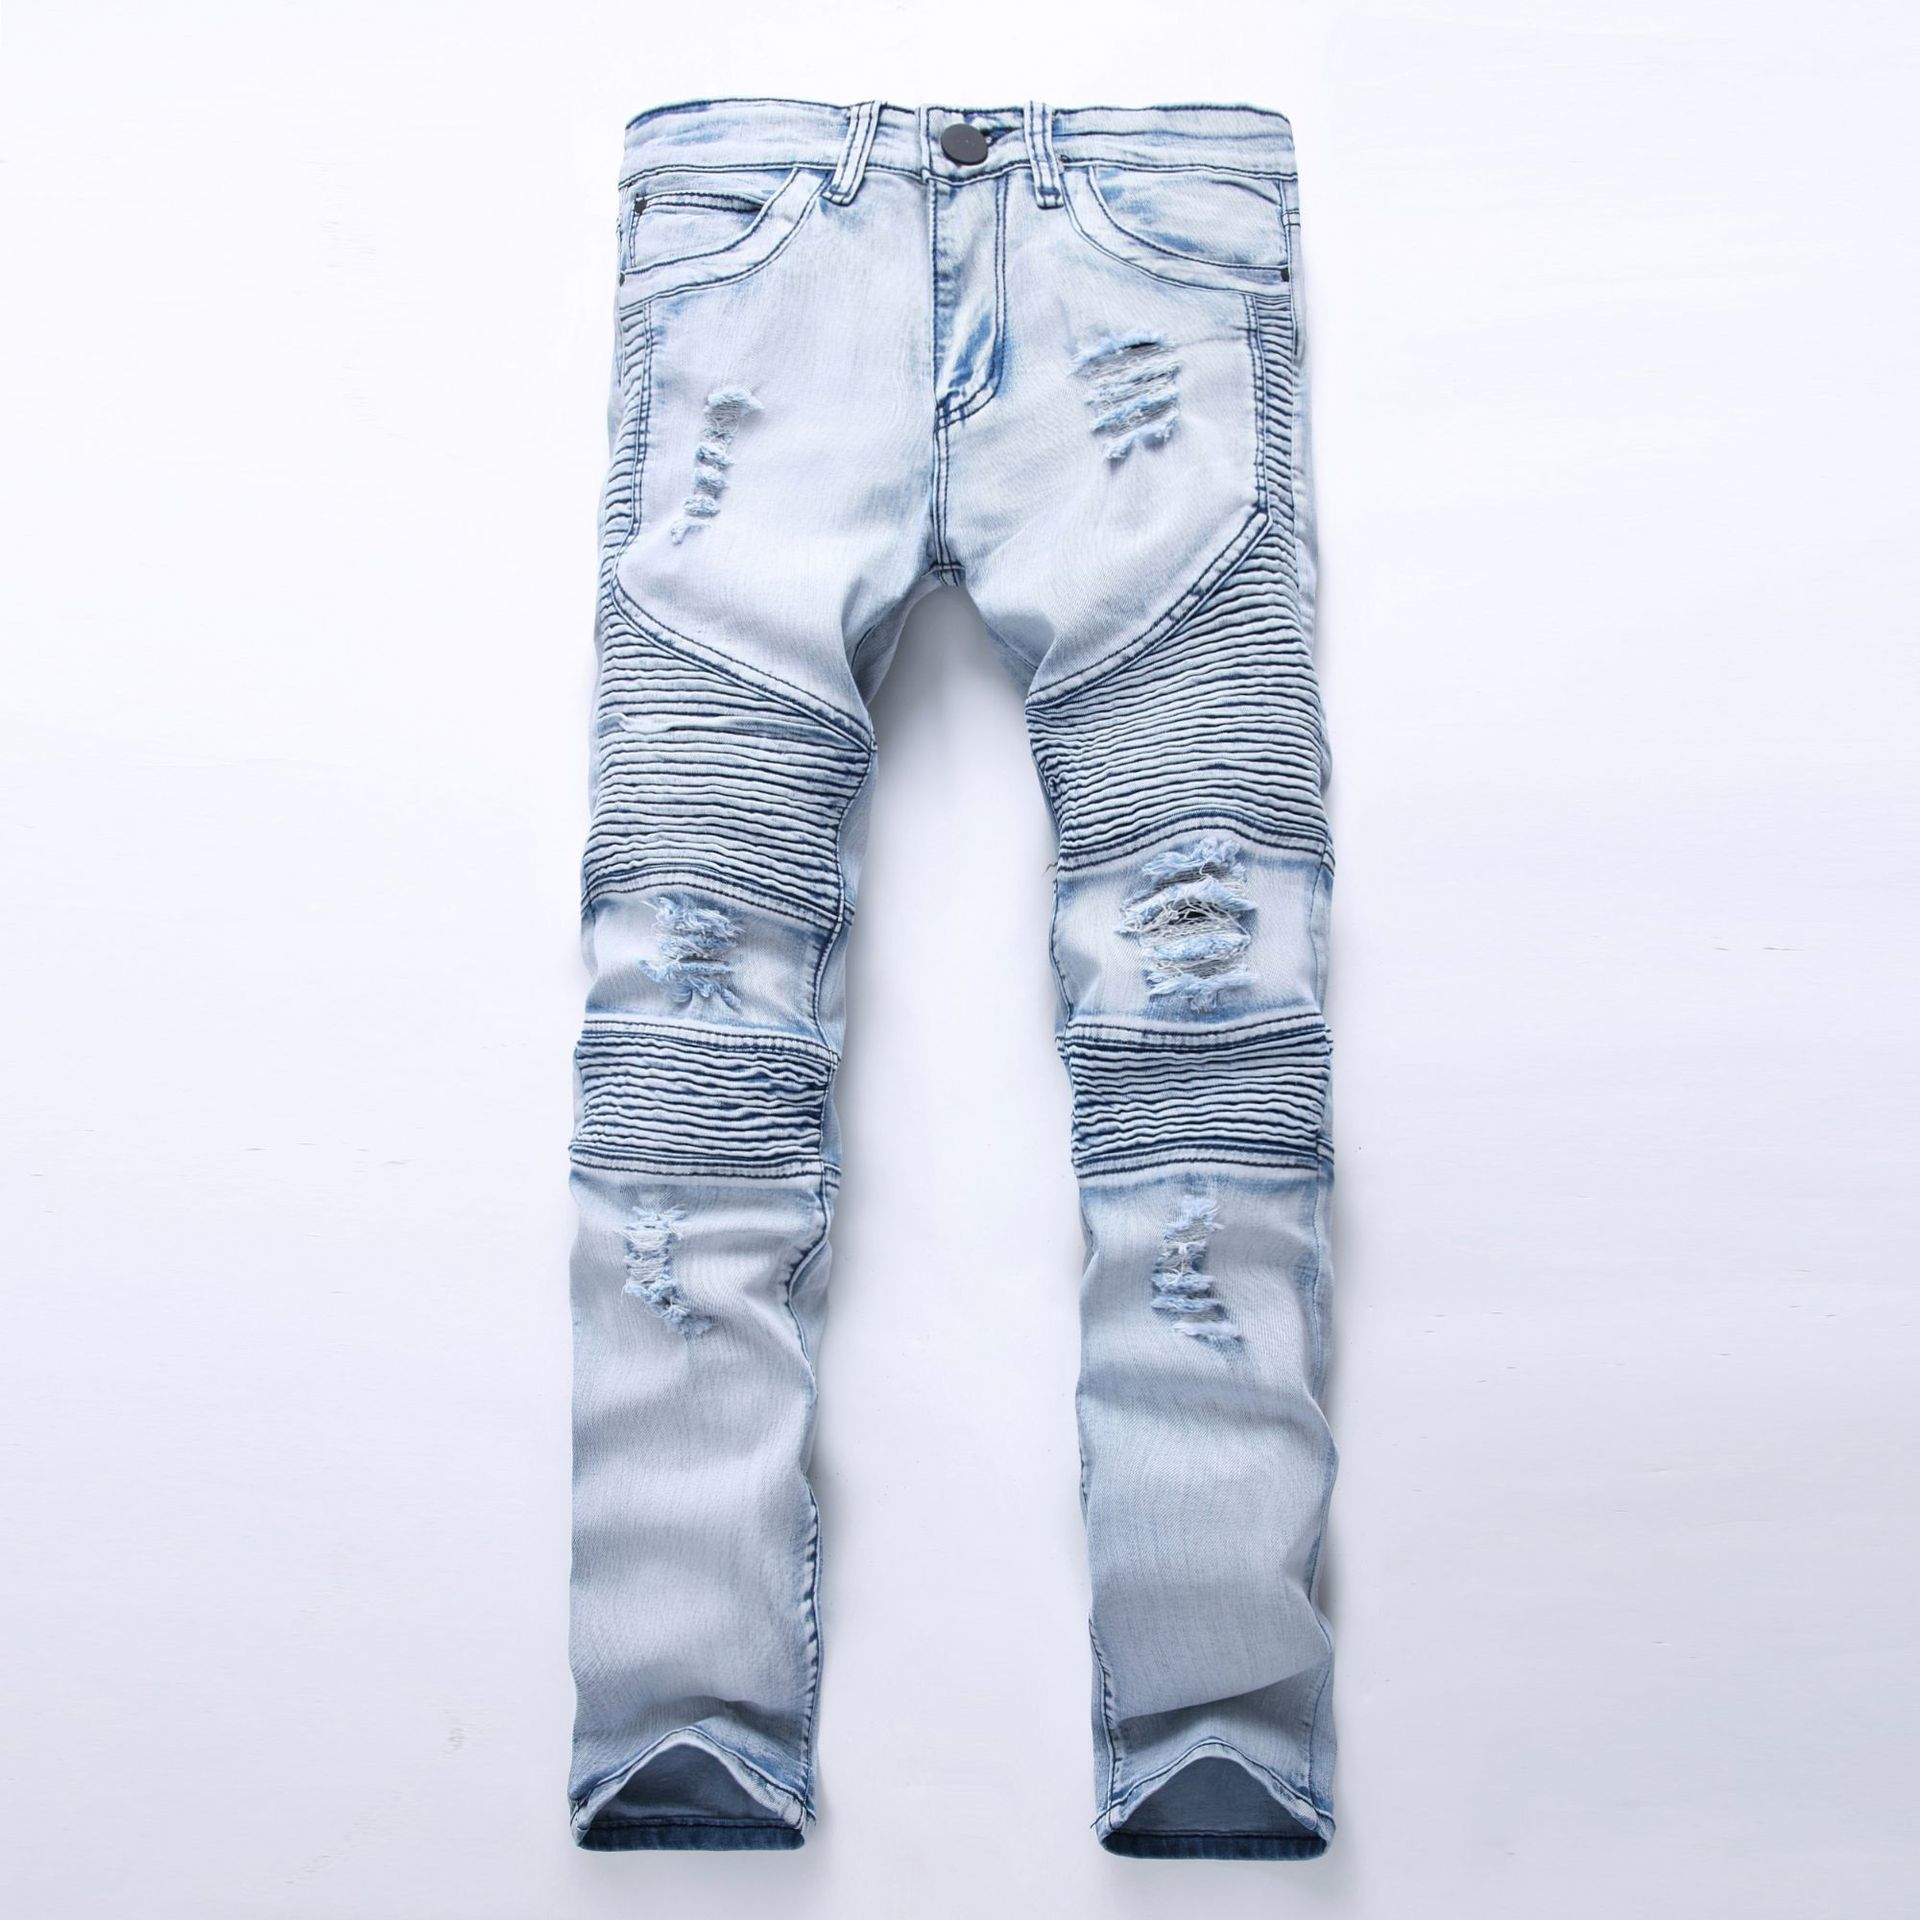 2020 Mens Jeans New Fashion Male Casual Biker Jeans Slim Straight Feet Jeans Loose Waist Long Trousers Denim Pants Large Size 42